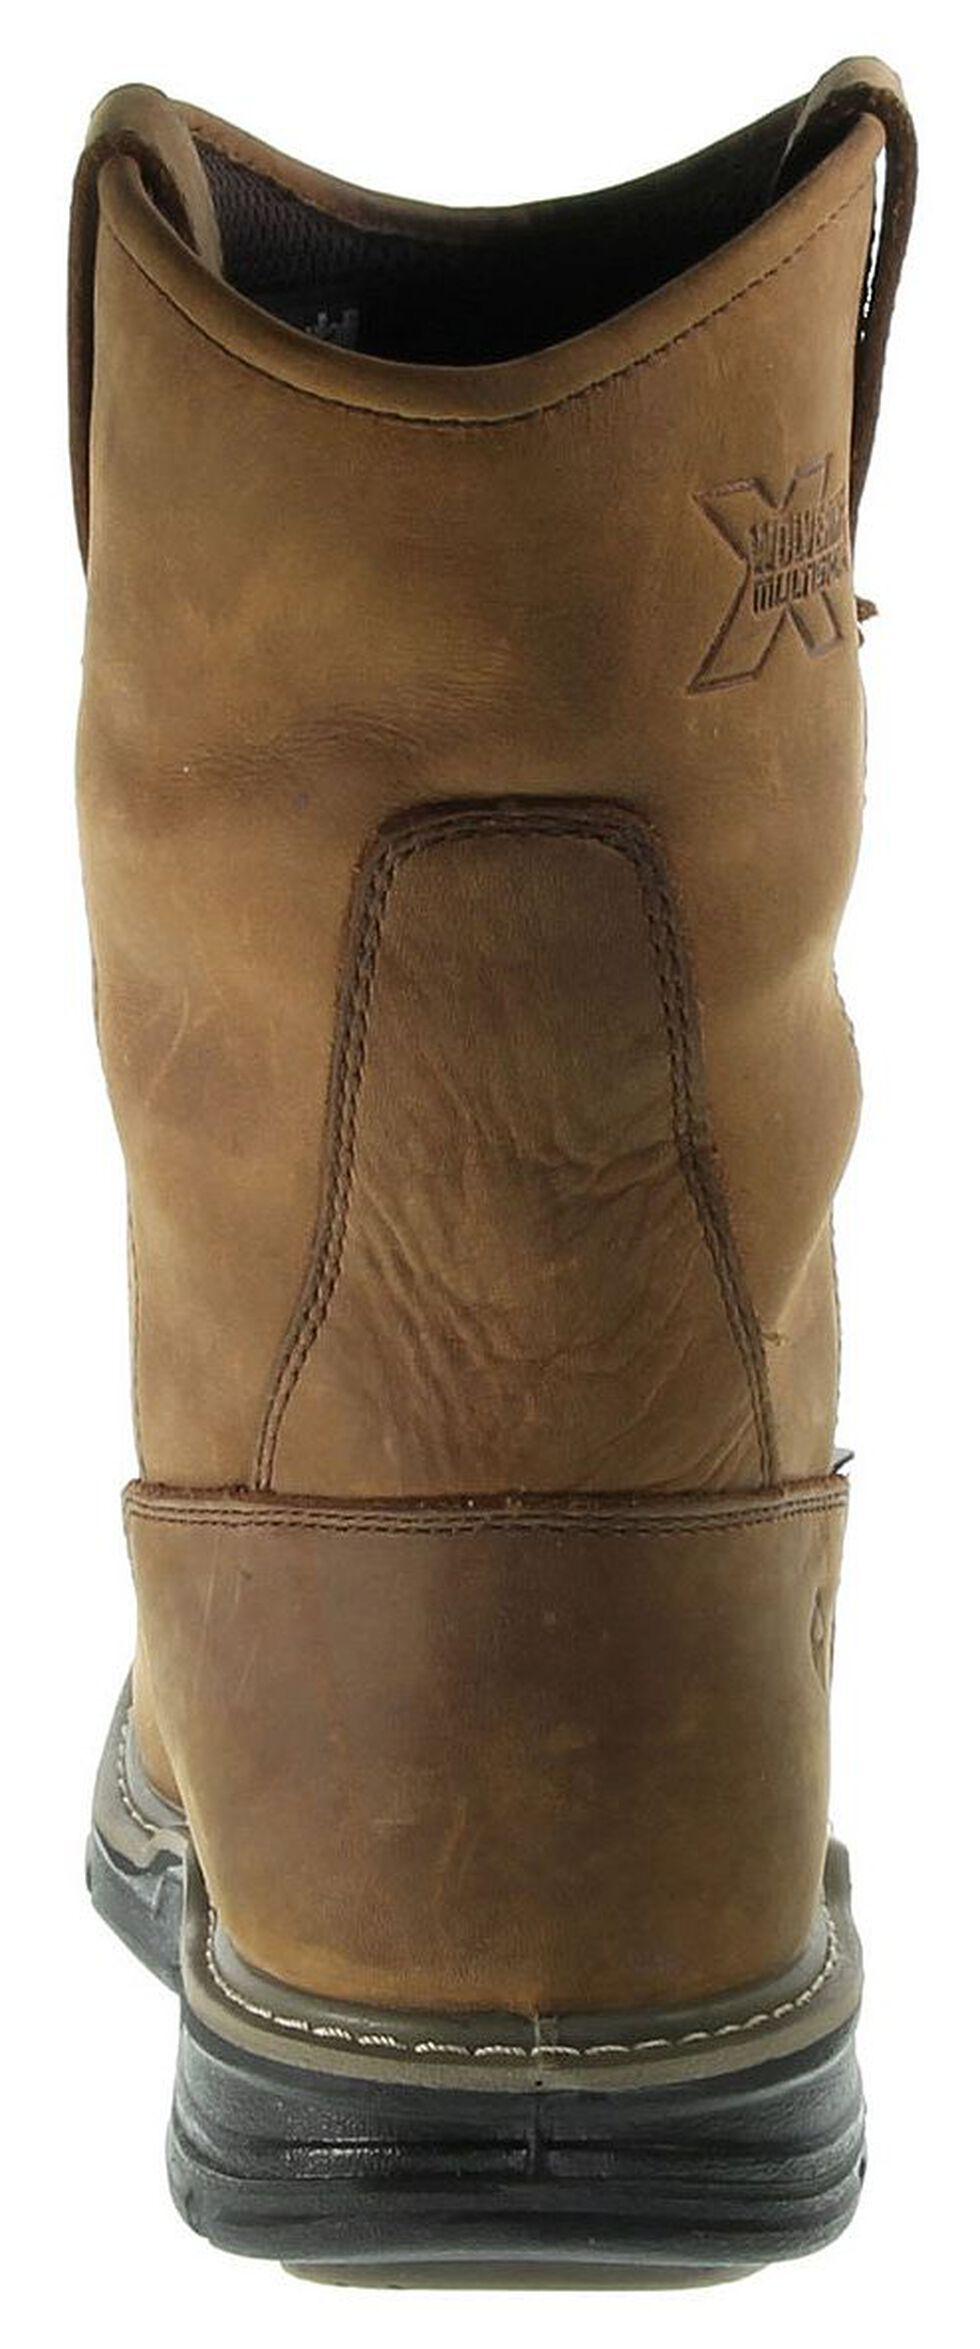 Wolverine Marauder Waterproof & Insulated Pull-On Work Boots - Steel Toe, Brown, hi-res